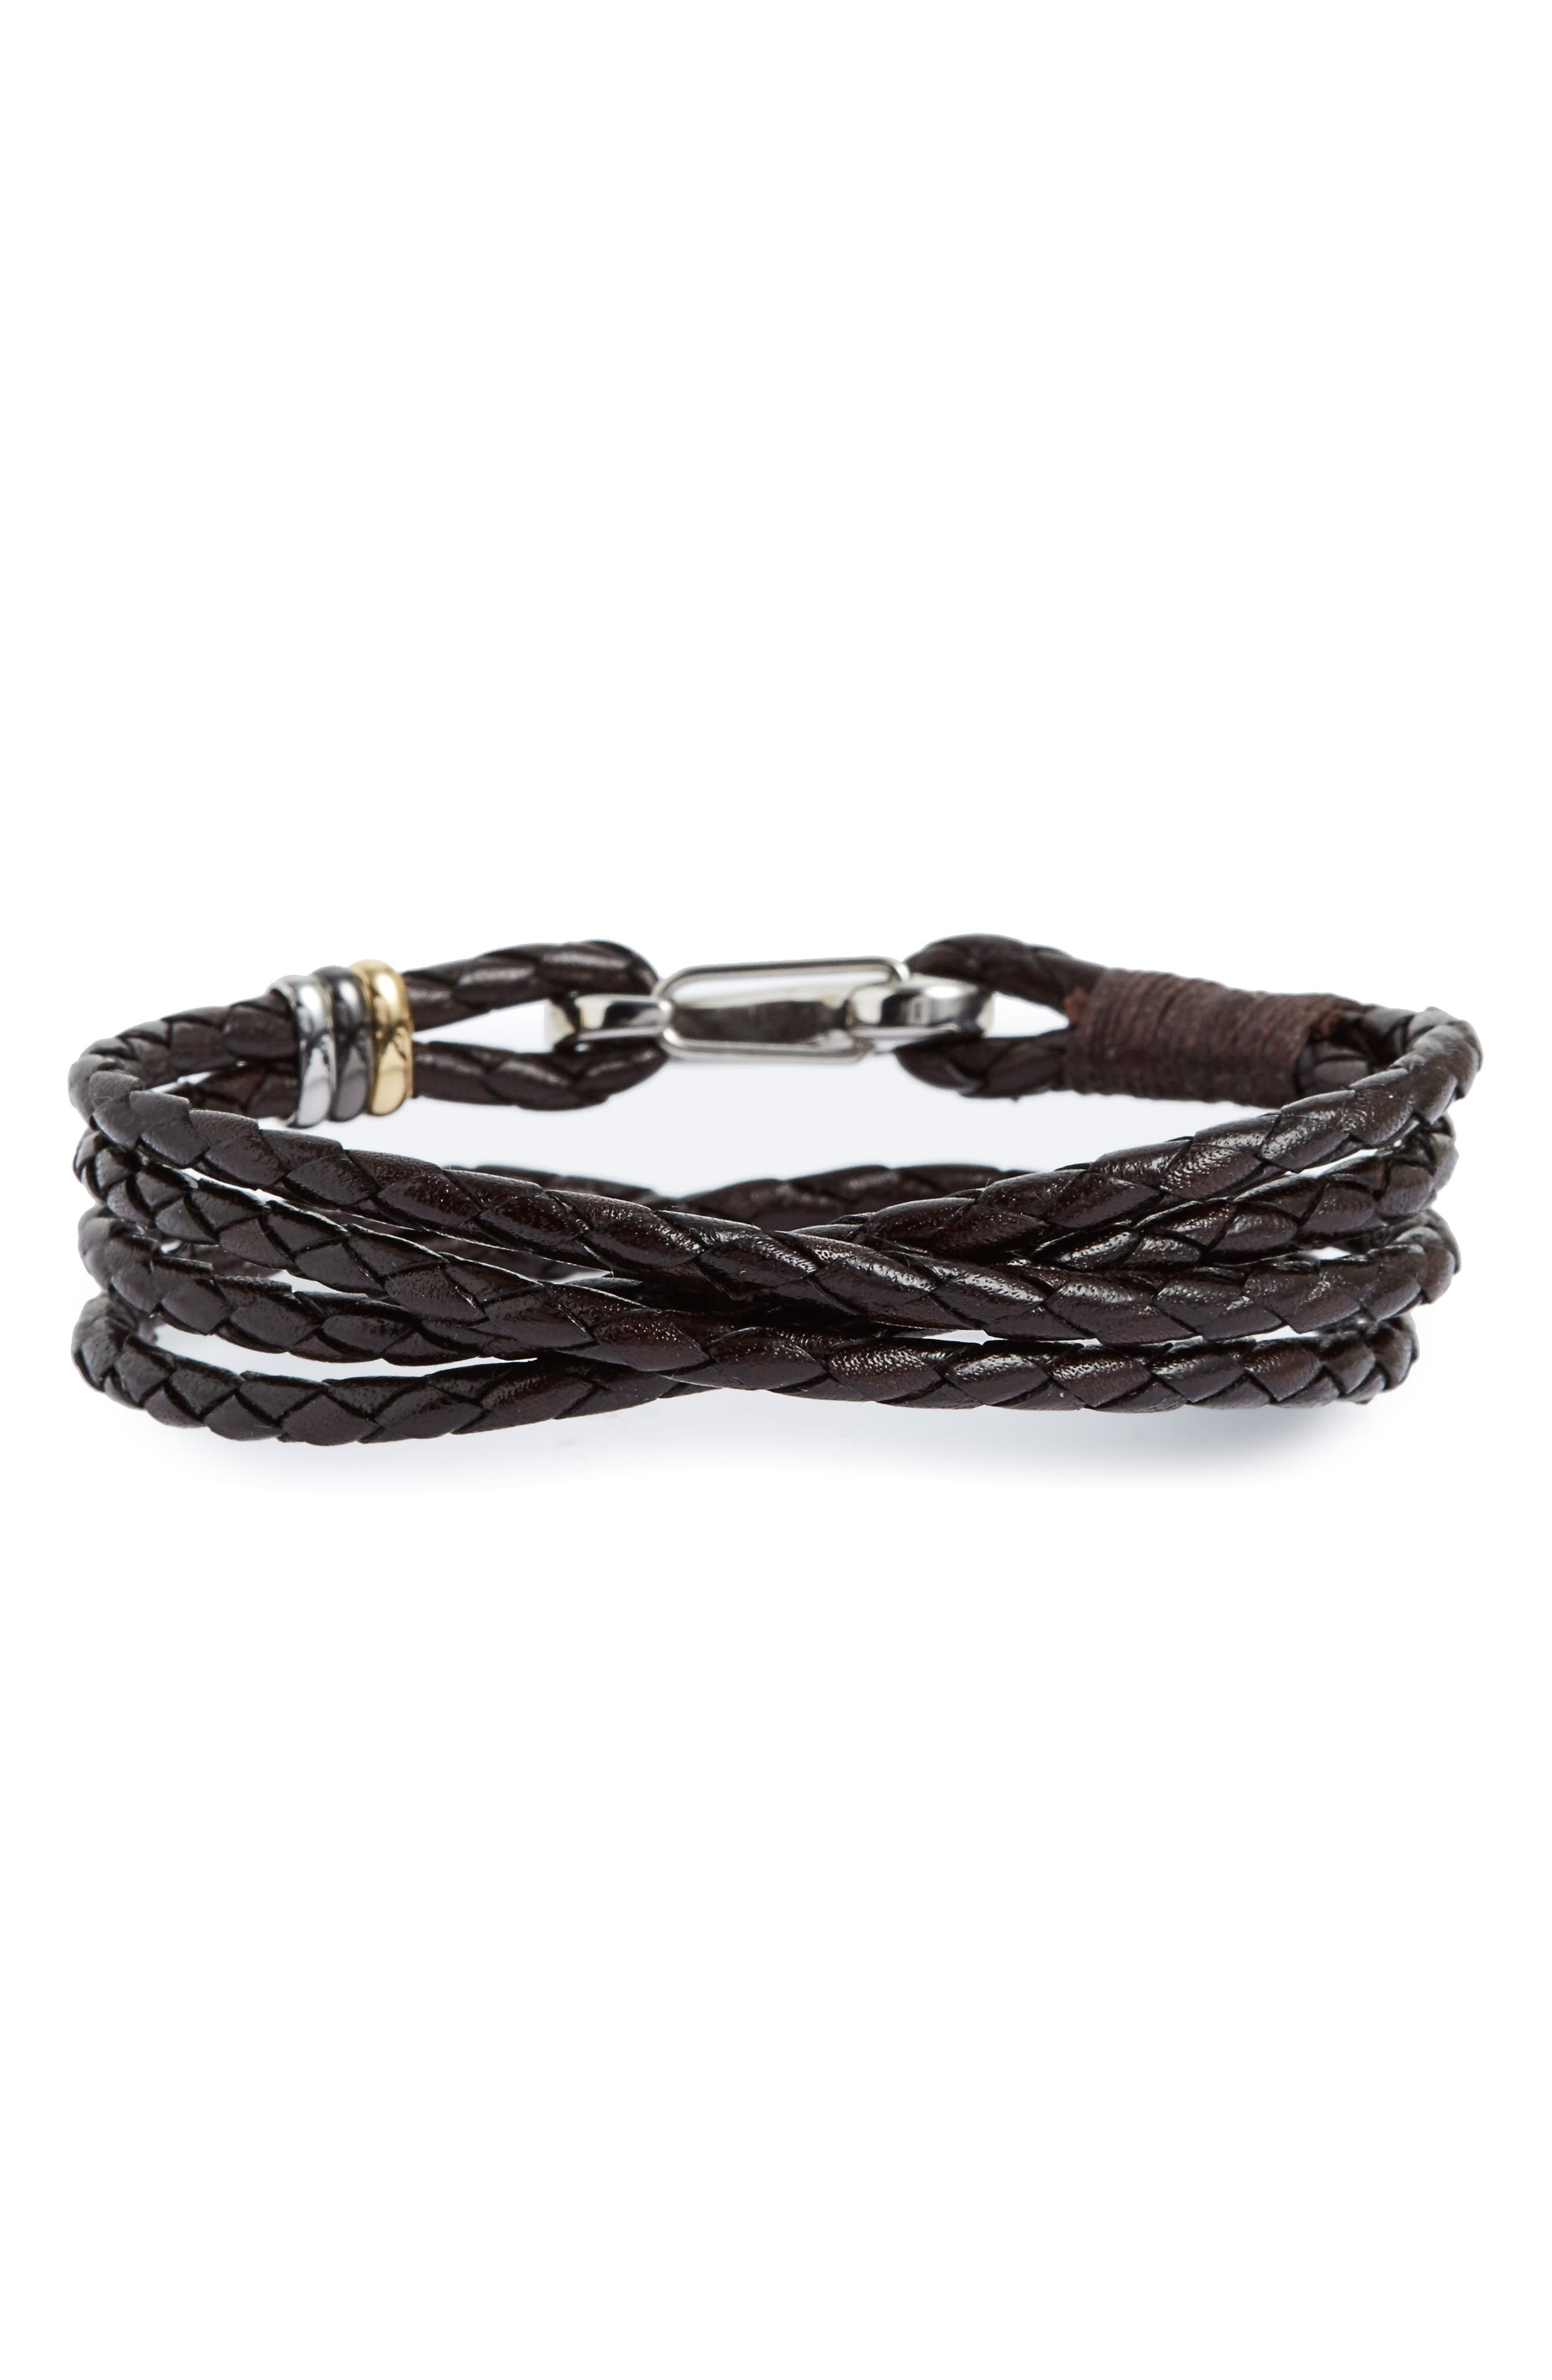 Braided Leather Wrap Bracelet,                             Main thumbnail 1, color,                             205